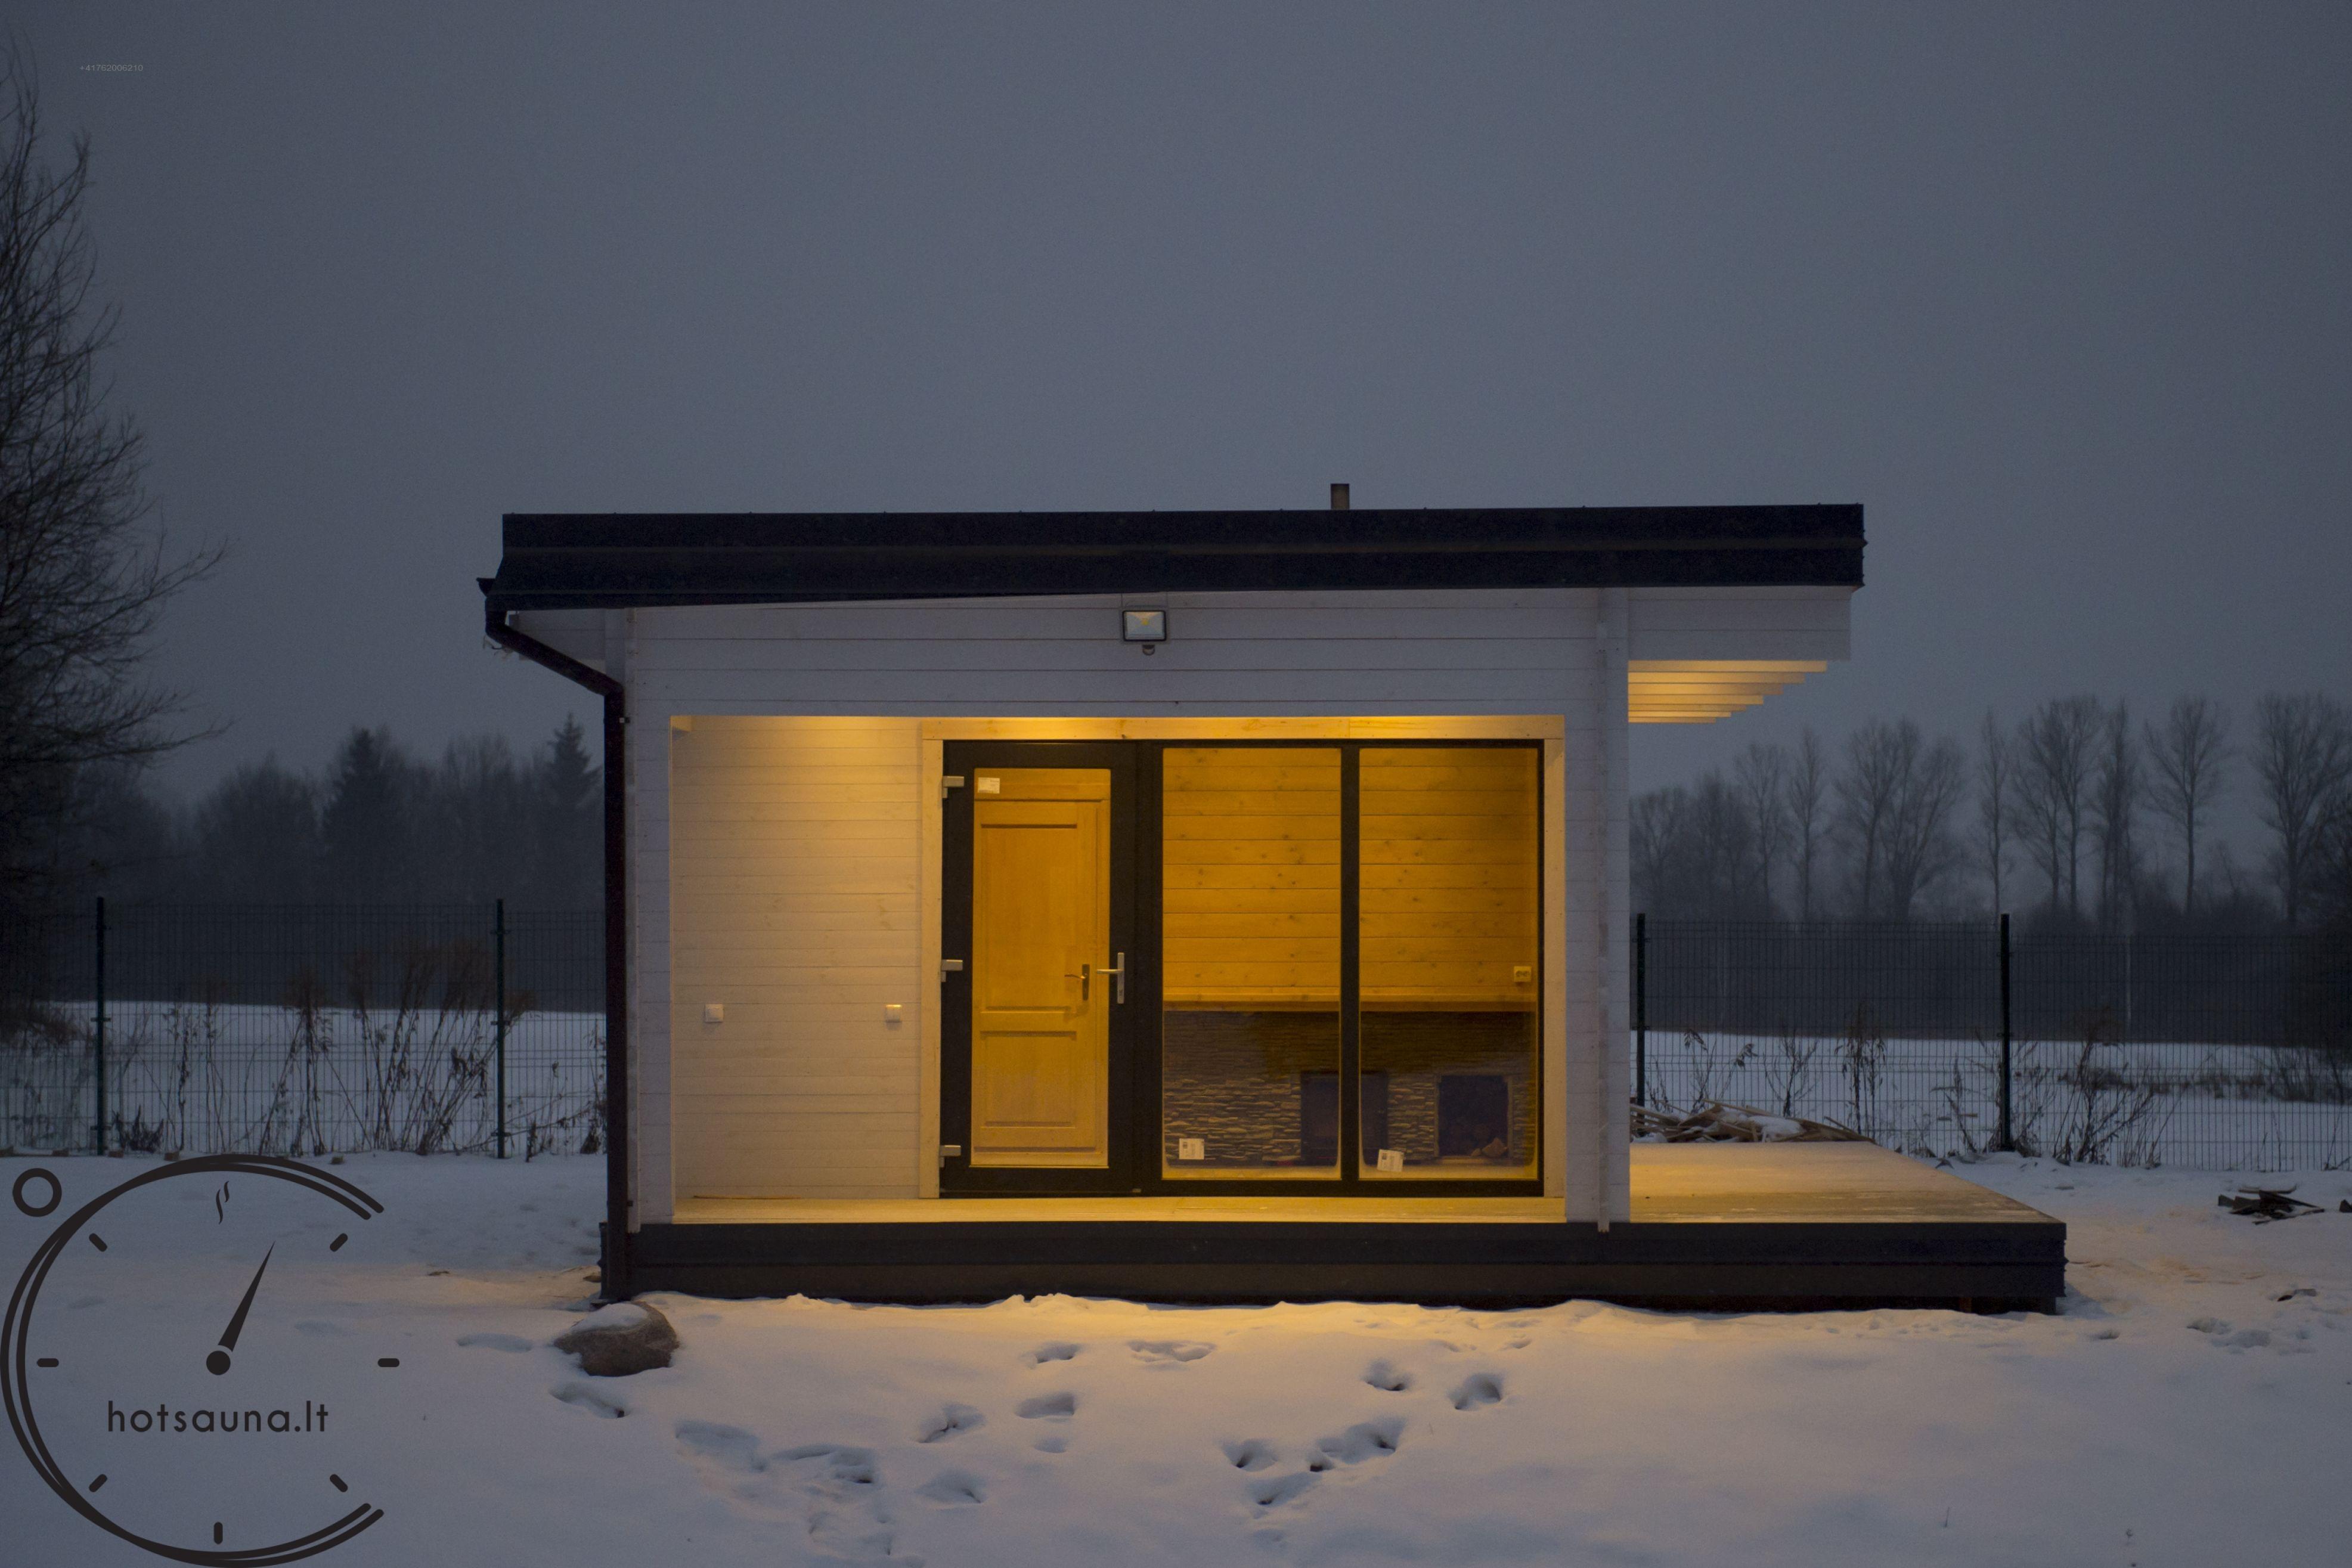 sauna for sale kauferproduktion saunamd1 (10)